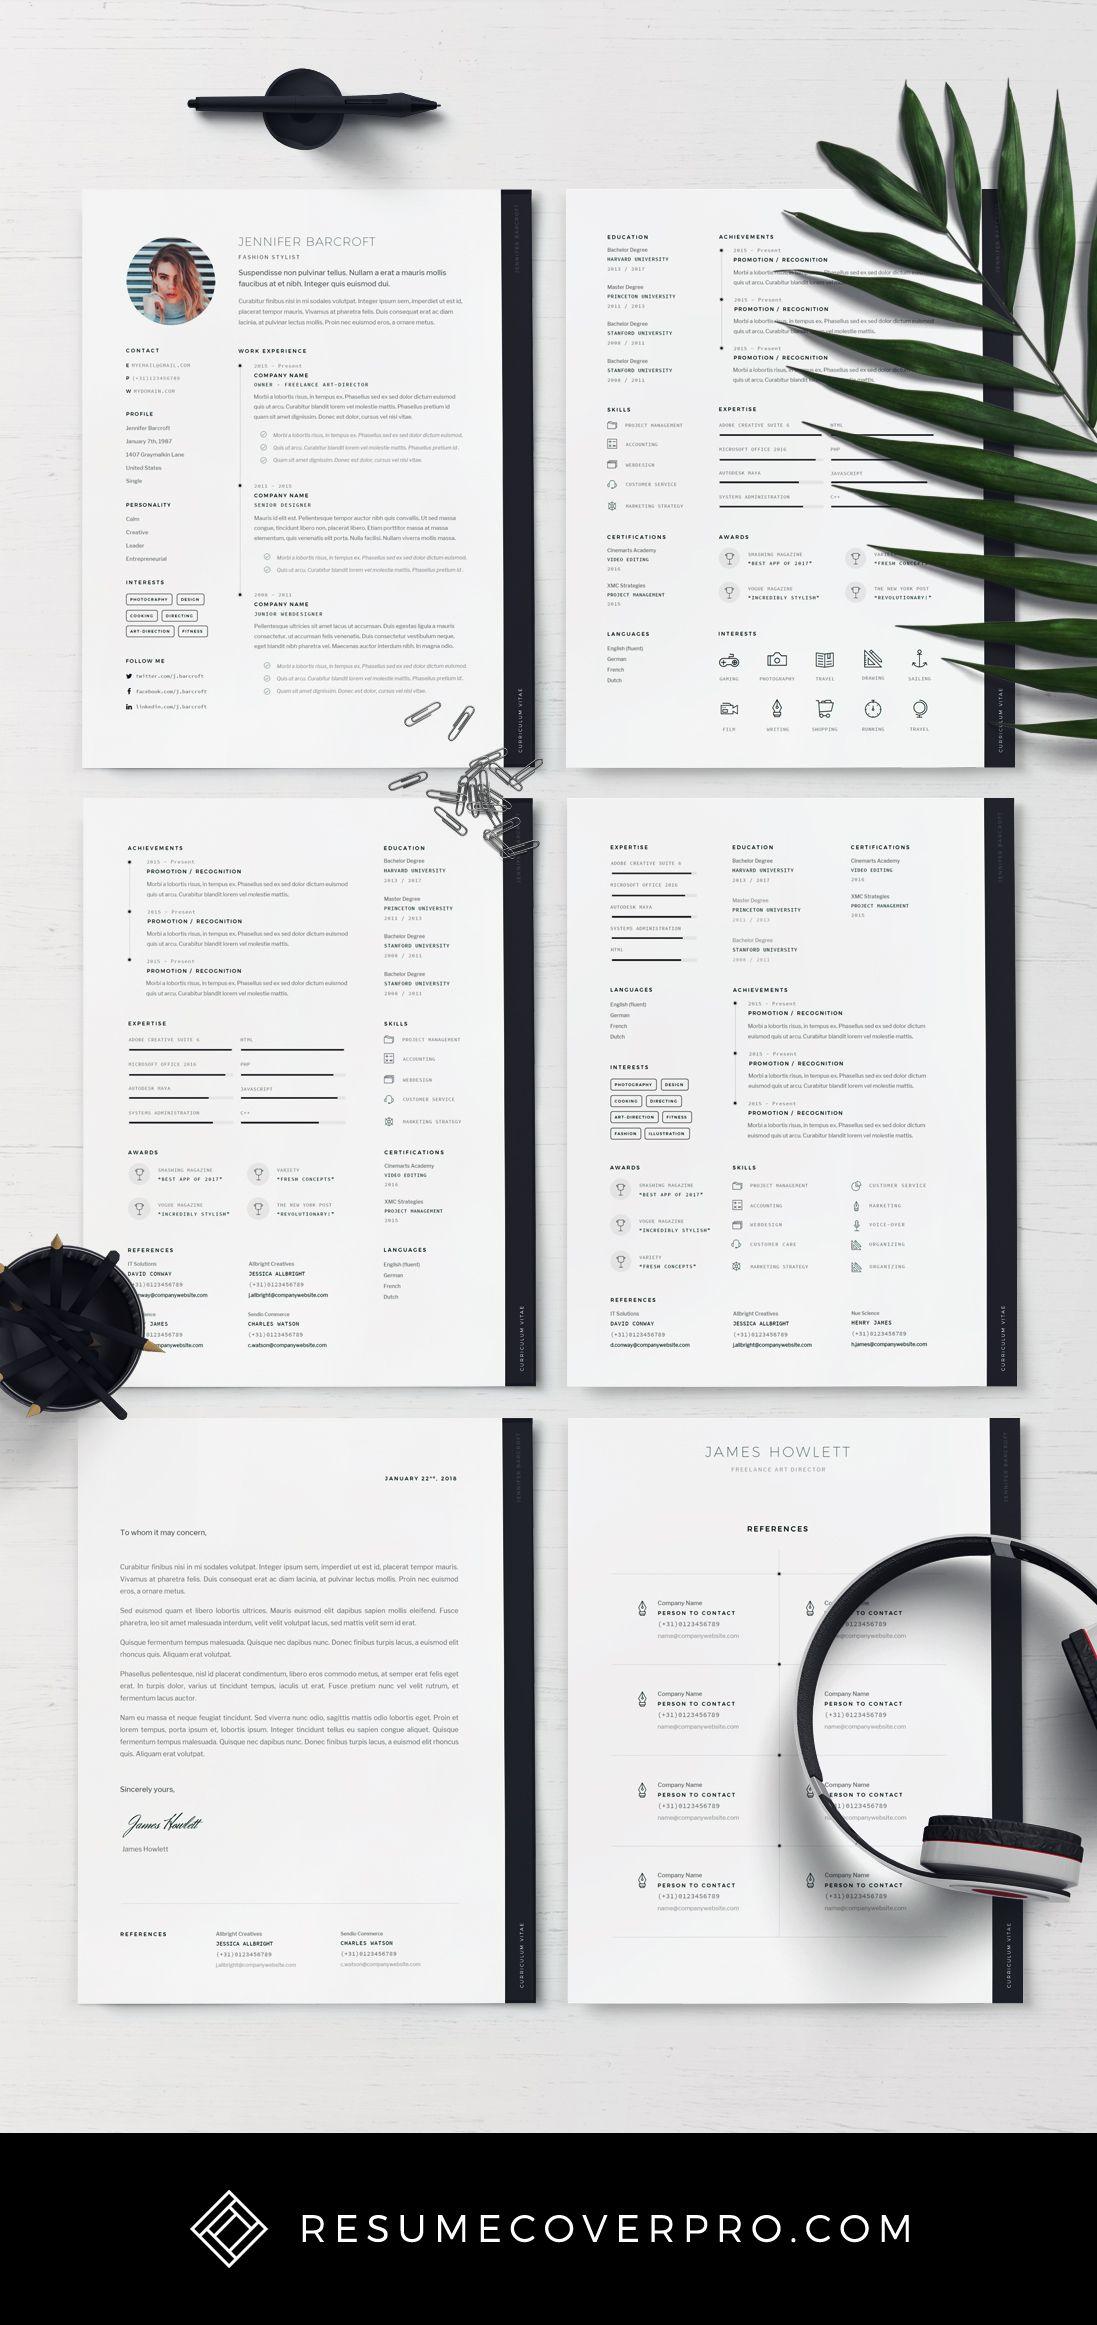 Minimalist Resume Template For Word | MS Word CV | Modern Resume |  Professional Resume |